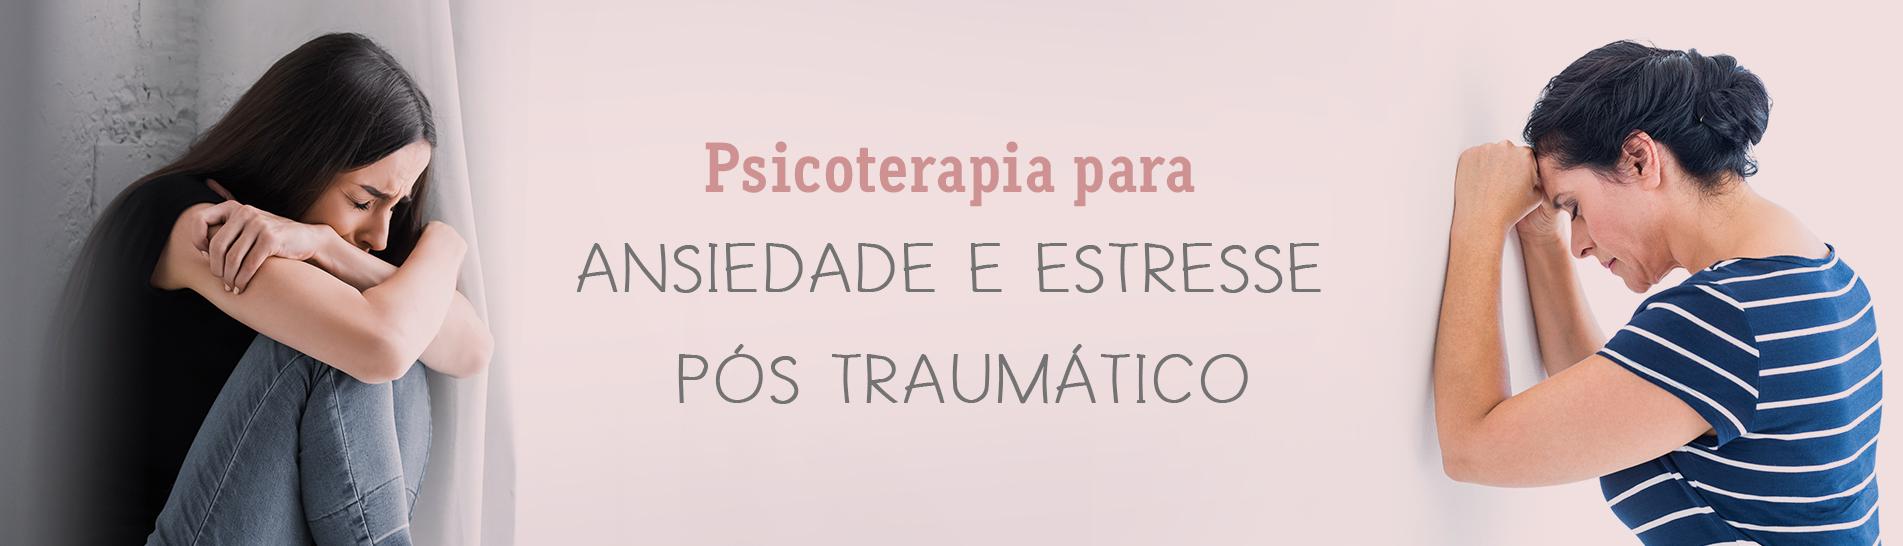 estresse pós traumatico